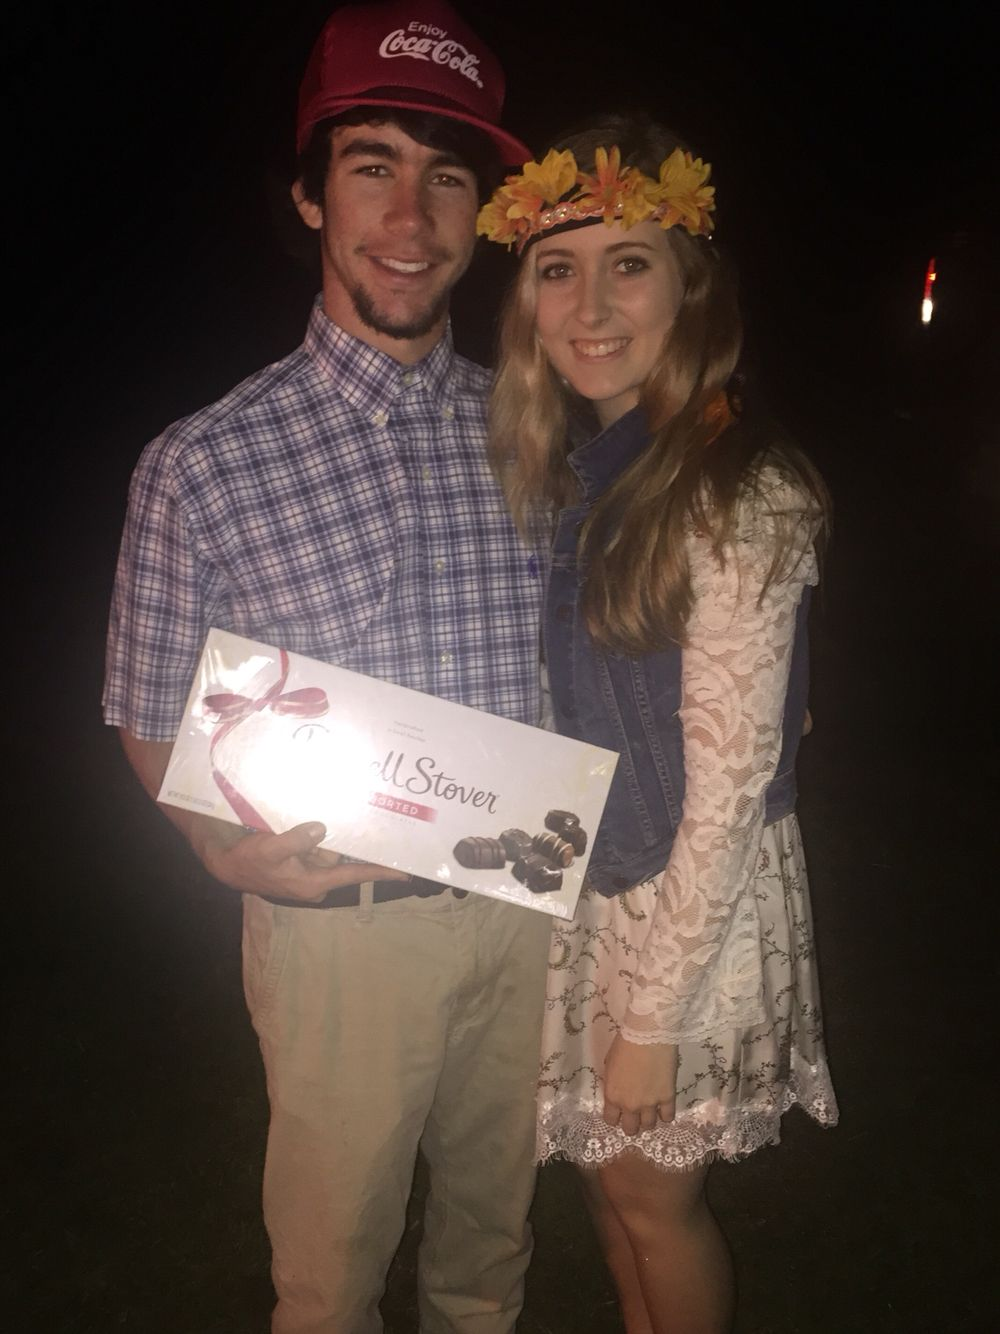 2a4e67fd2cd Forrest Gump and Jenny DIY Couple Costume. Perfect last minute idea ...